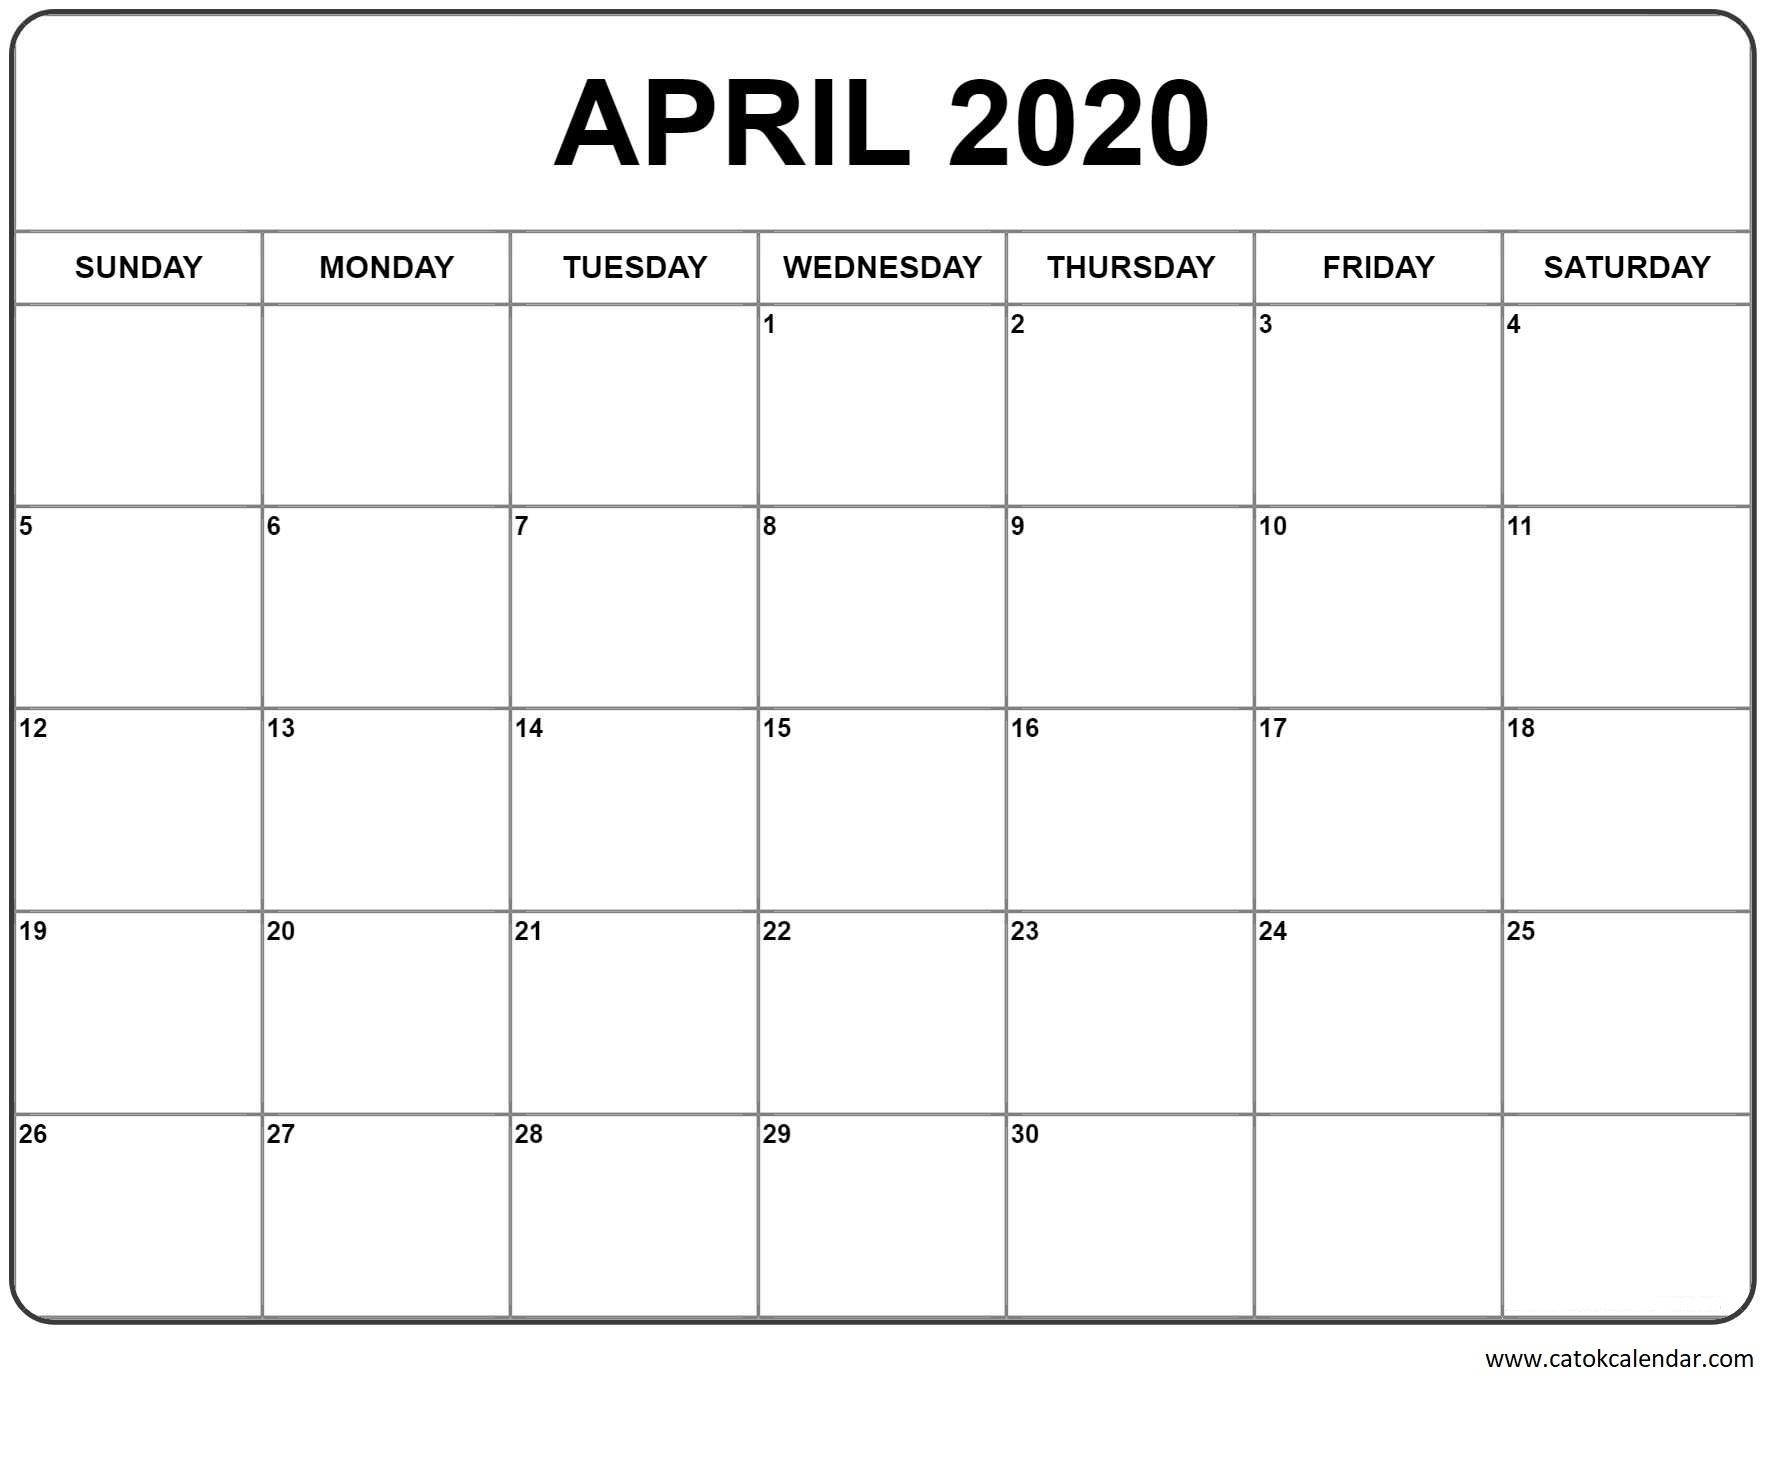 Julian Date Calendar 2021 | Printable Calendar Template 2020 pertaining to 2021 Yearly Julian Calendar